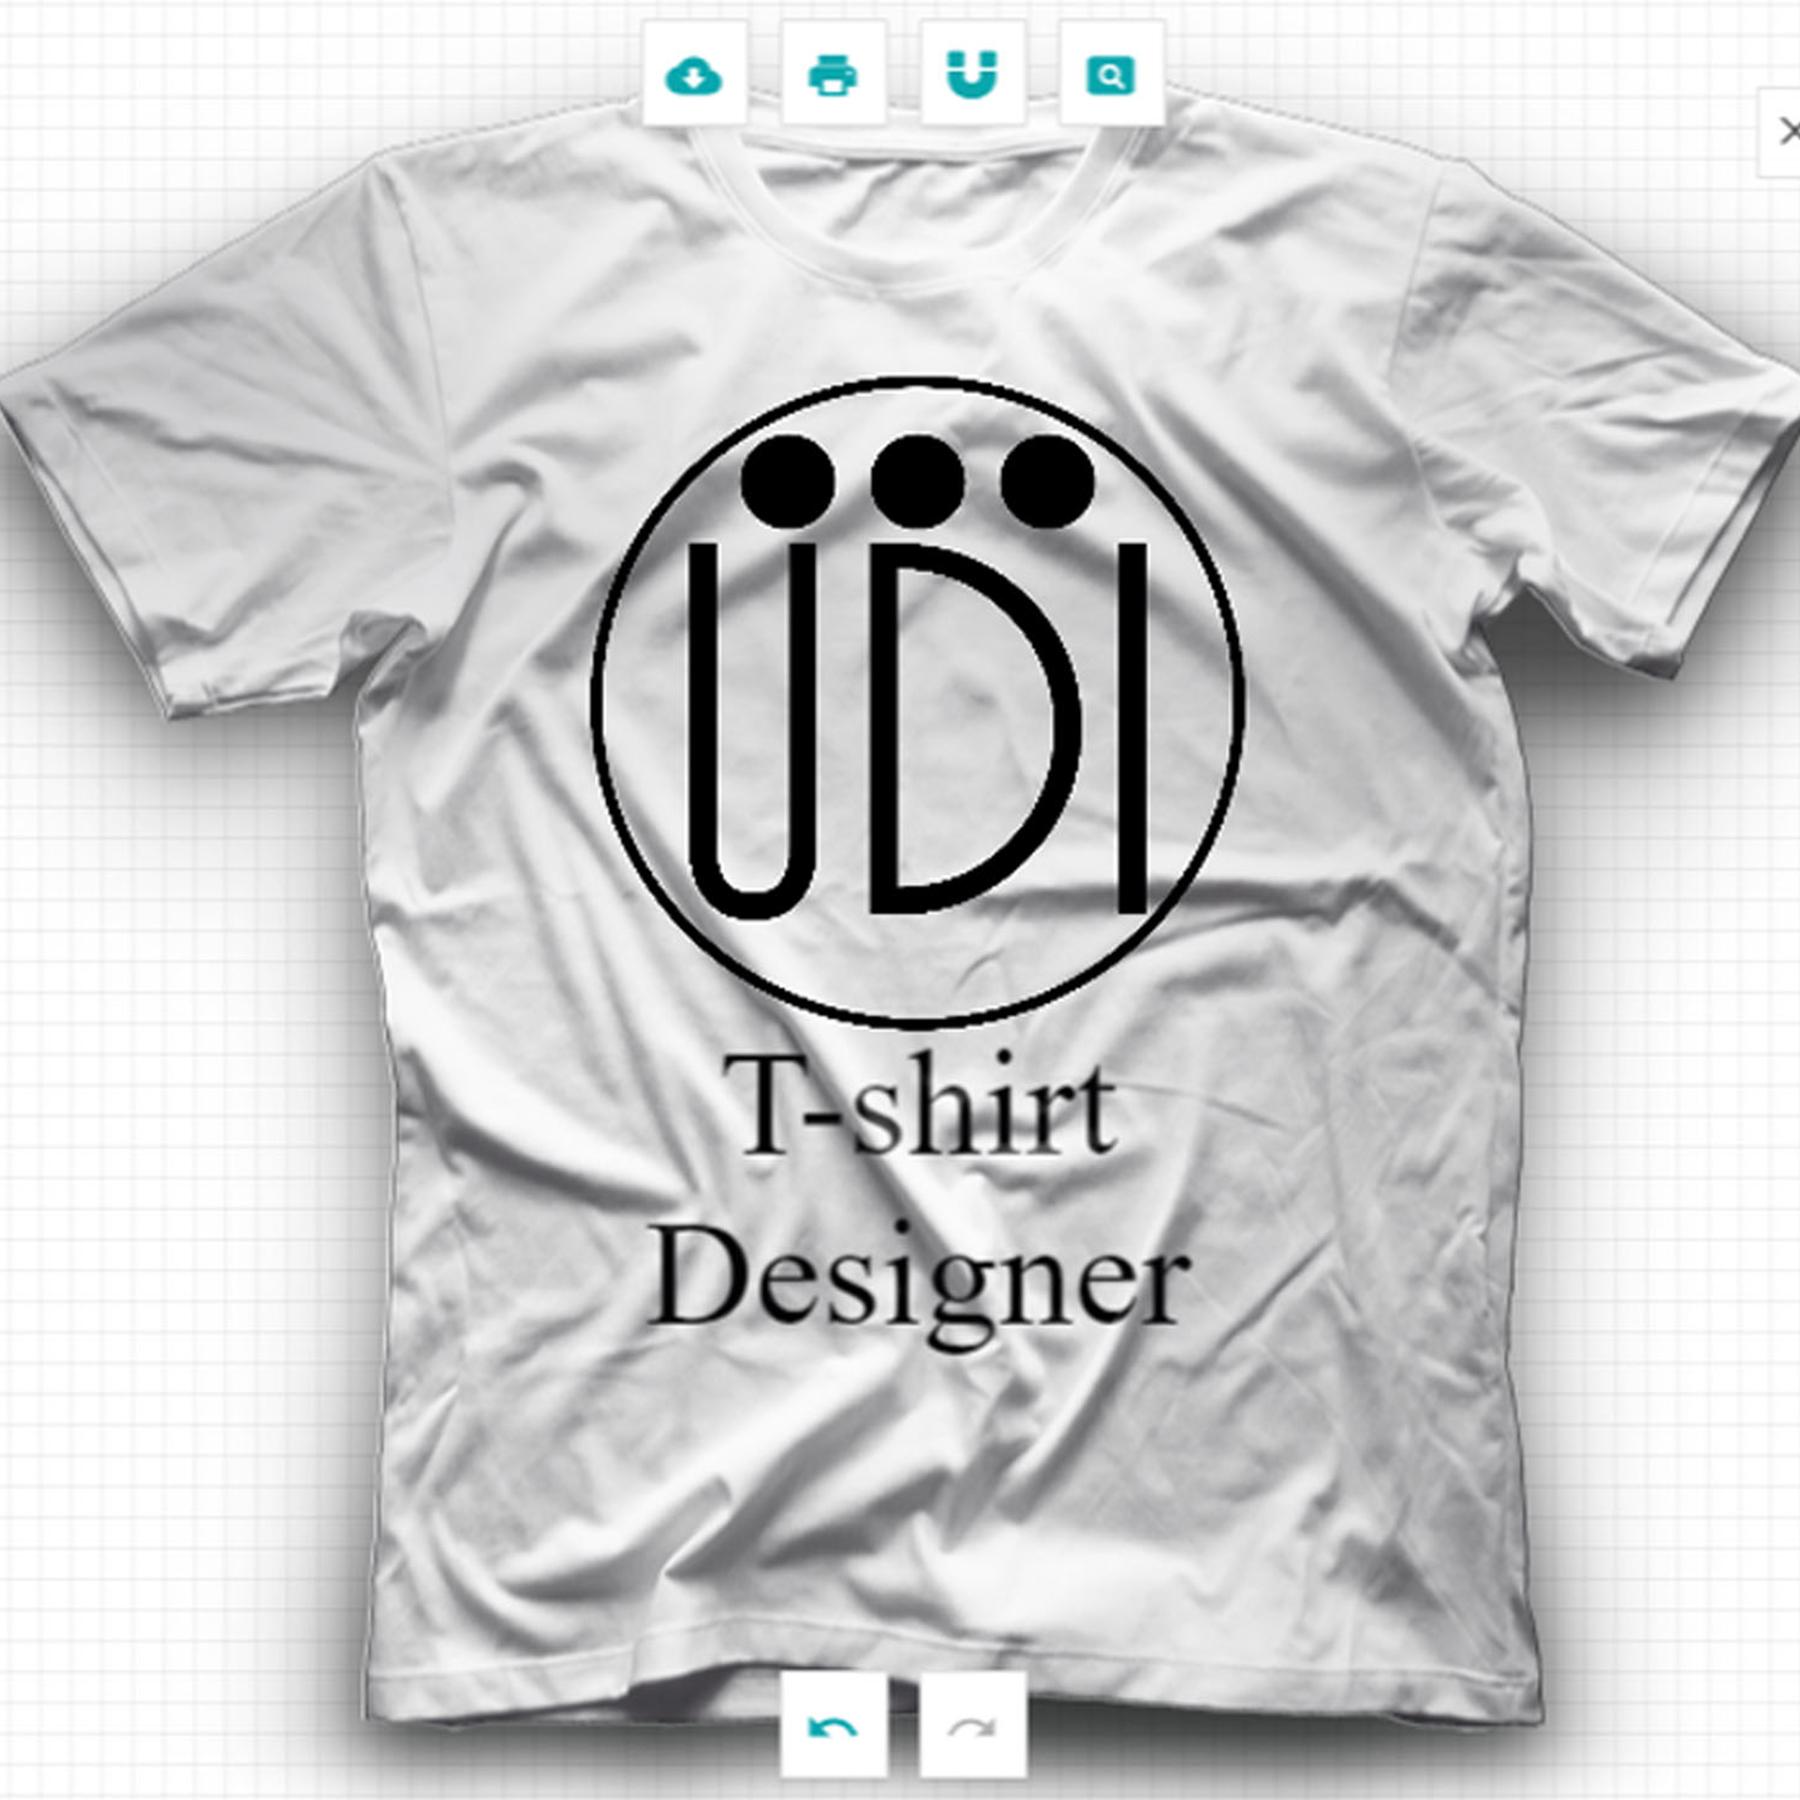 aa0e5c4fb U Design It- Homepage - Screen Printing   T-Shirt Printing in 954 ...